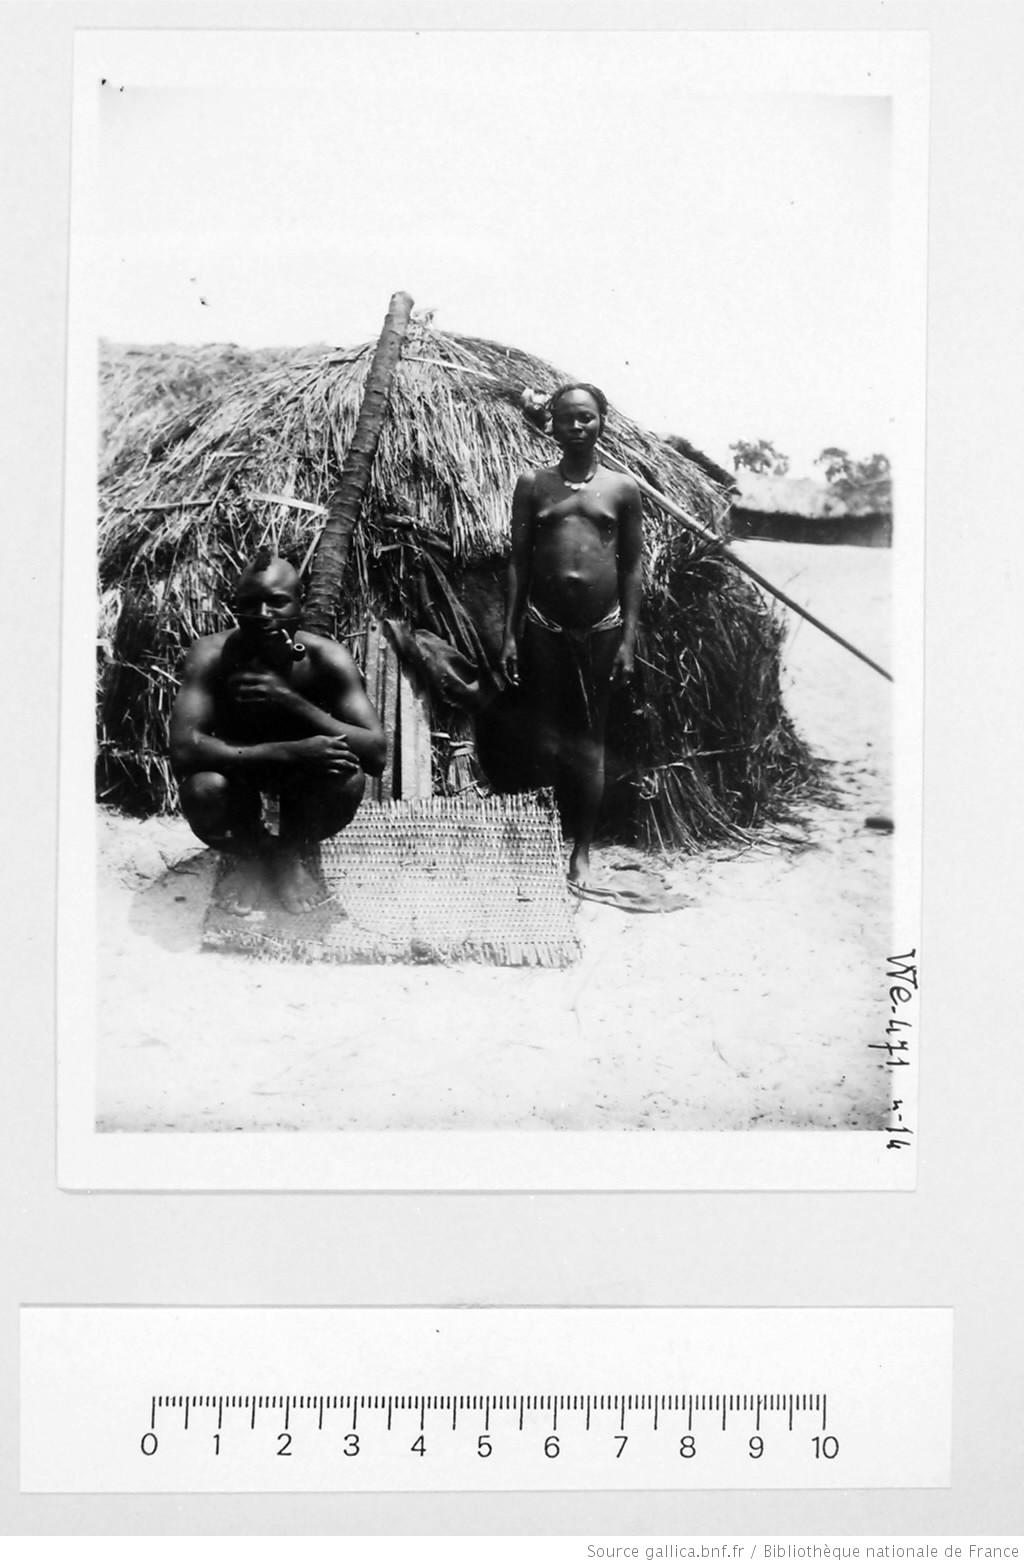 [39 phot. d'A.E.F. en 1924. Enregistré en 1936] - 14